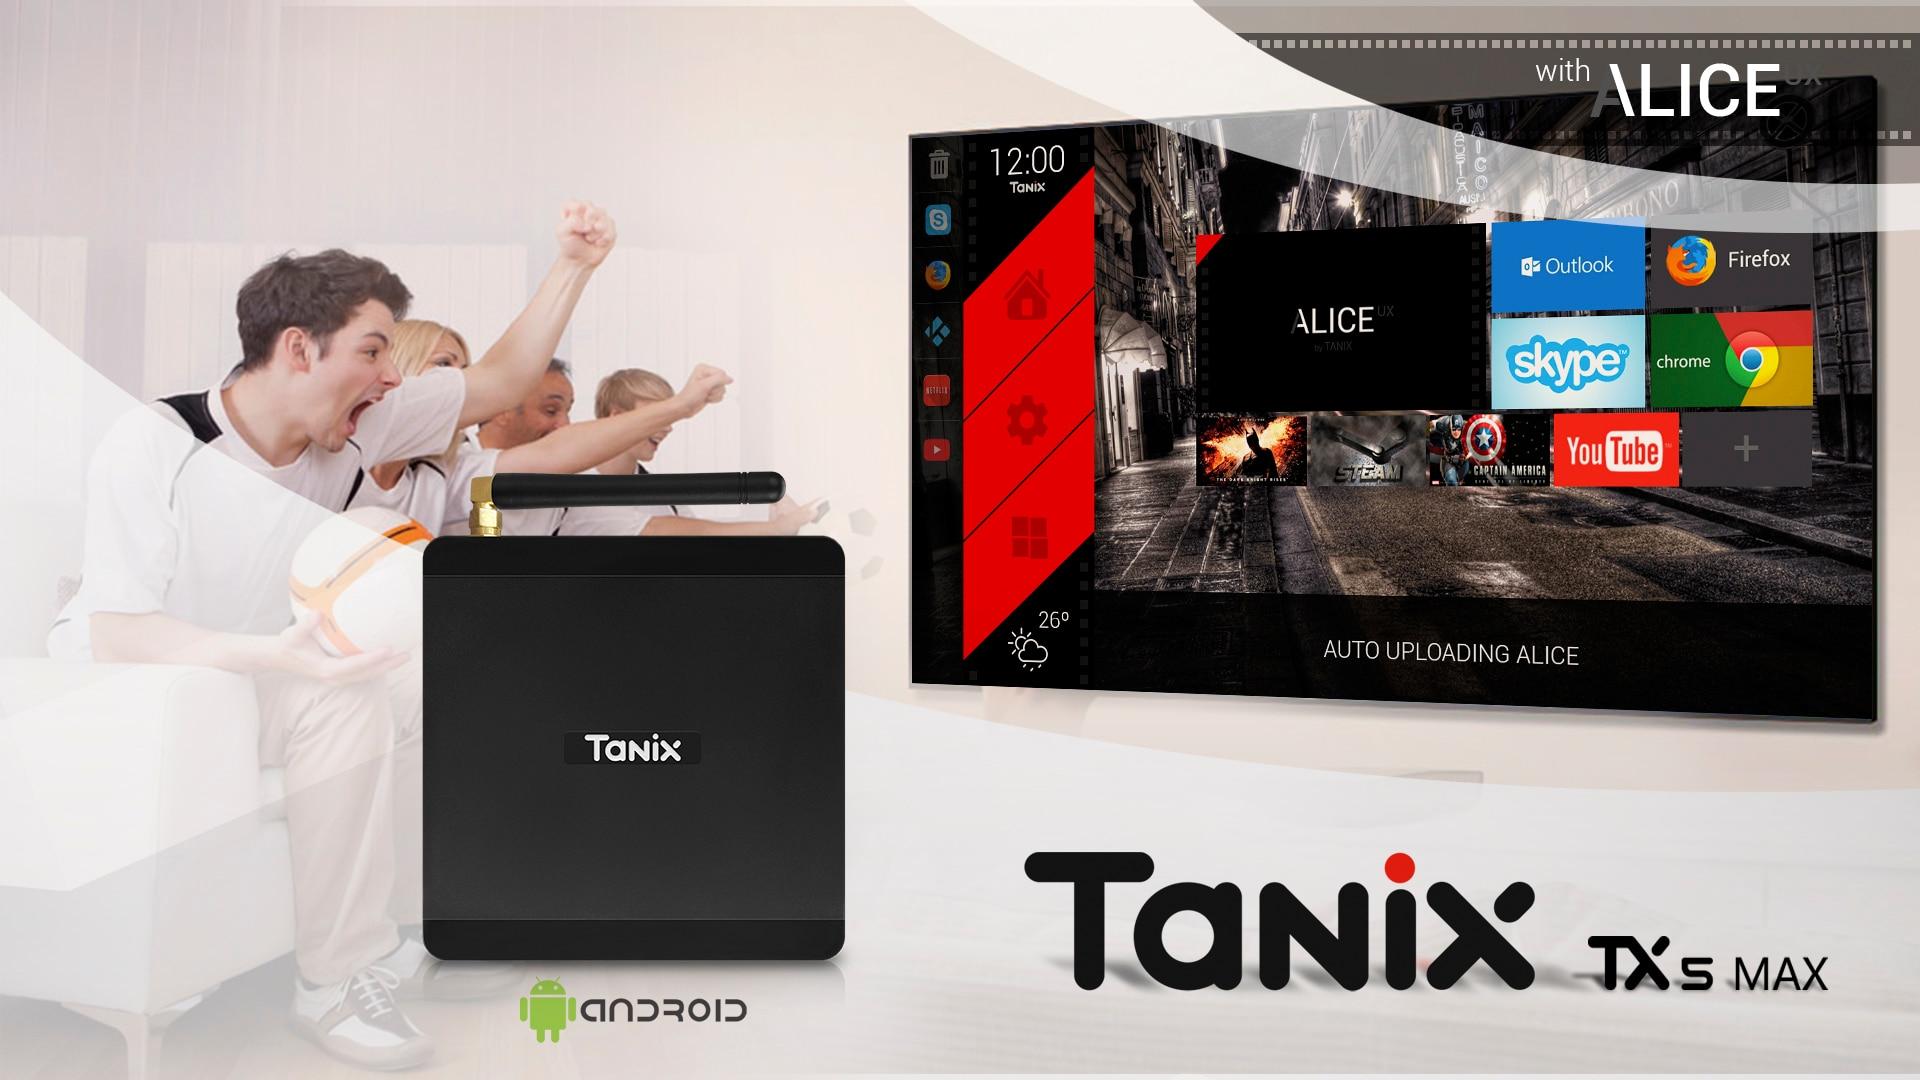 TX5 MAX DDR4 4 GB RAM 32 GB ROM 2,4G 5G WiFi 1000 M LAN Bluetooth Android 8,1 TV caja Amlogic S905X2 Quad Core 4 K HD caja inteligente - 4